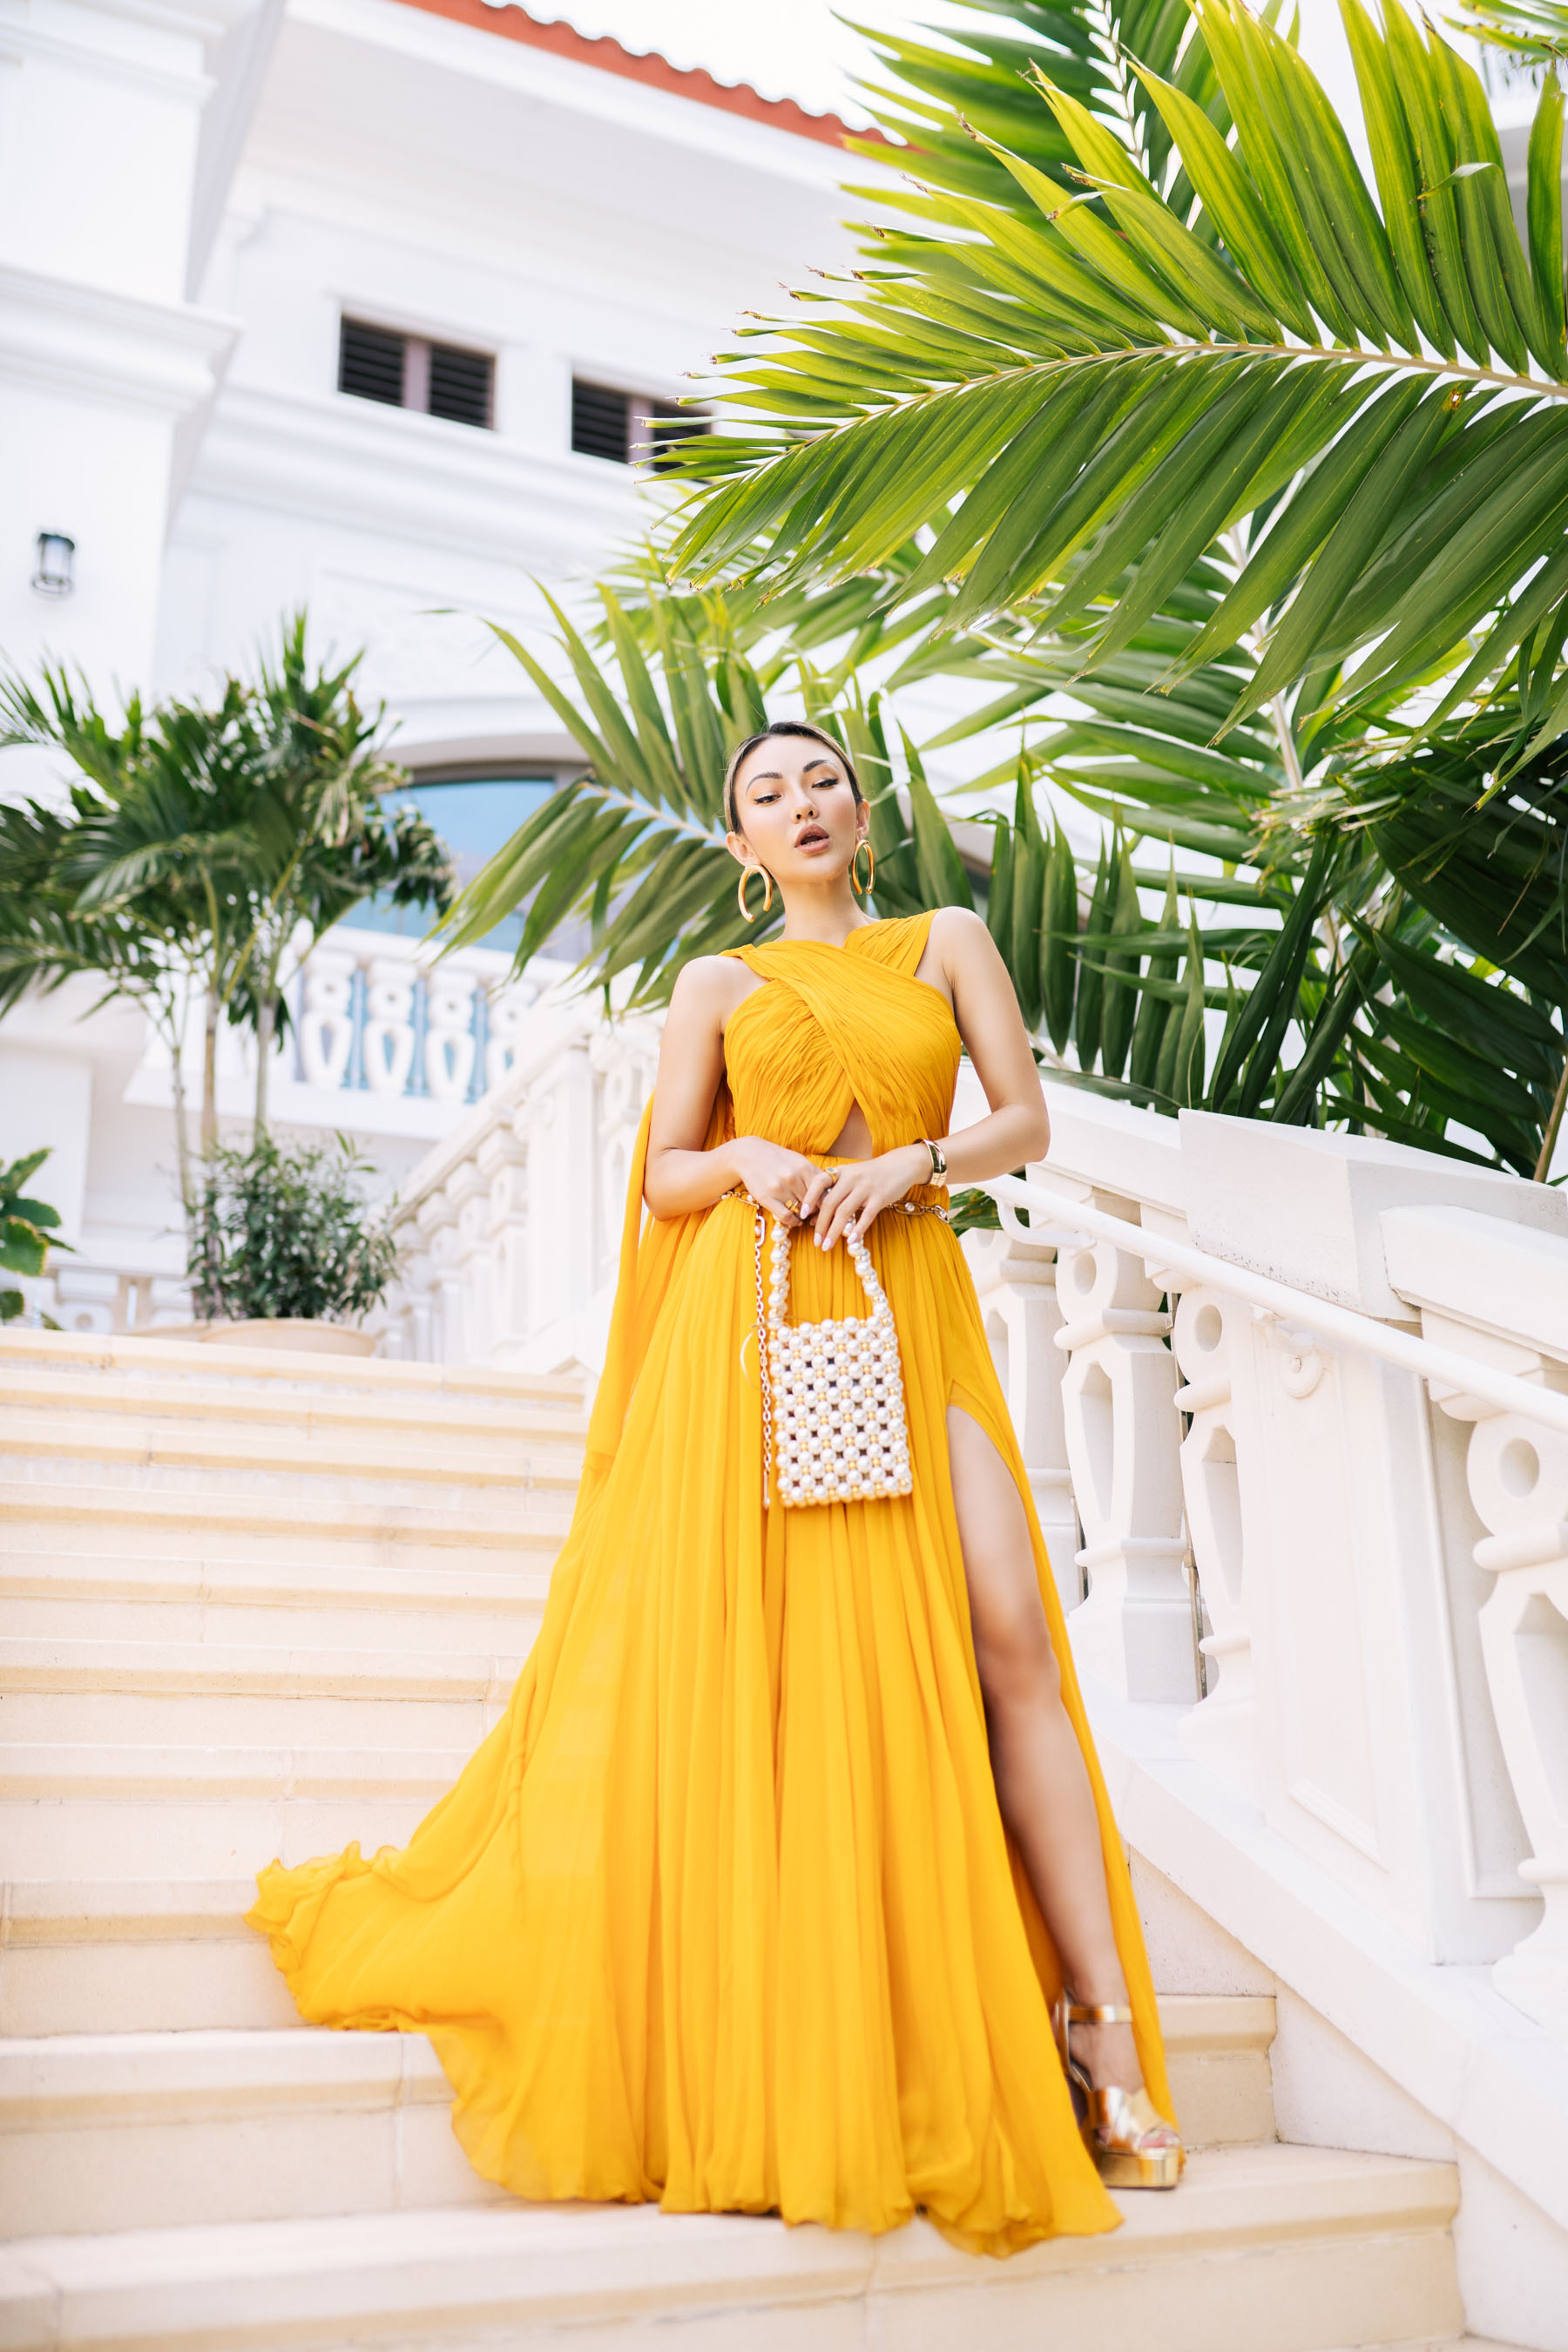 summer 2019 color trends, yellow jumpsuit, yellow for summer, yellow oscar de la renta dress, cannes france // Notjessfashion.com